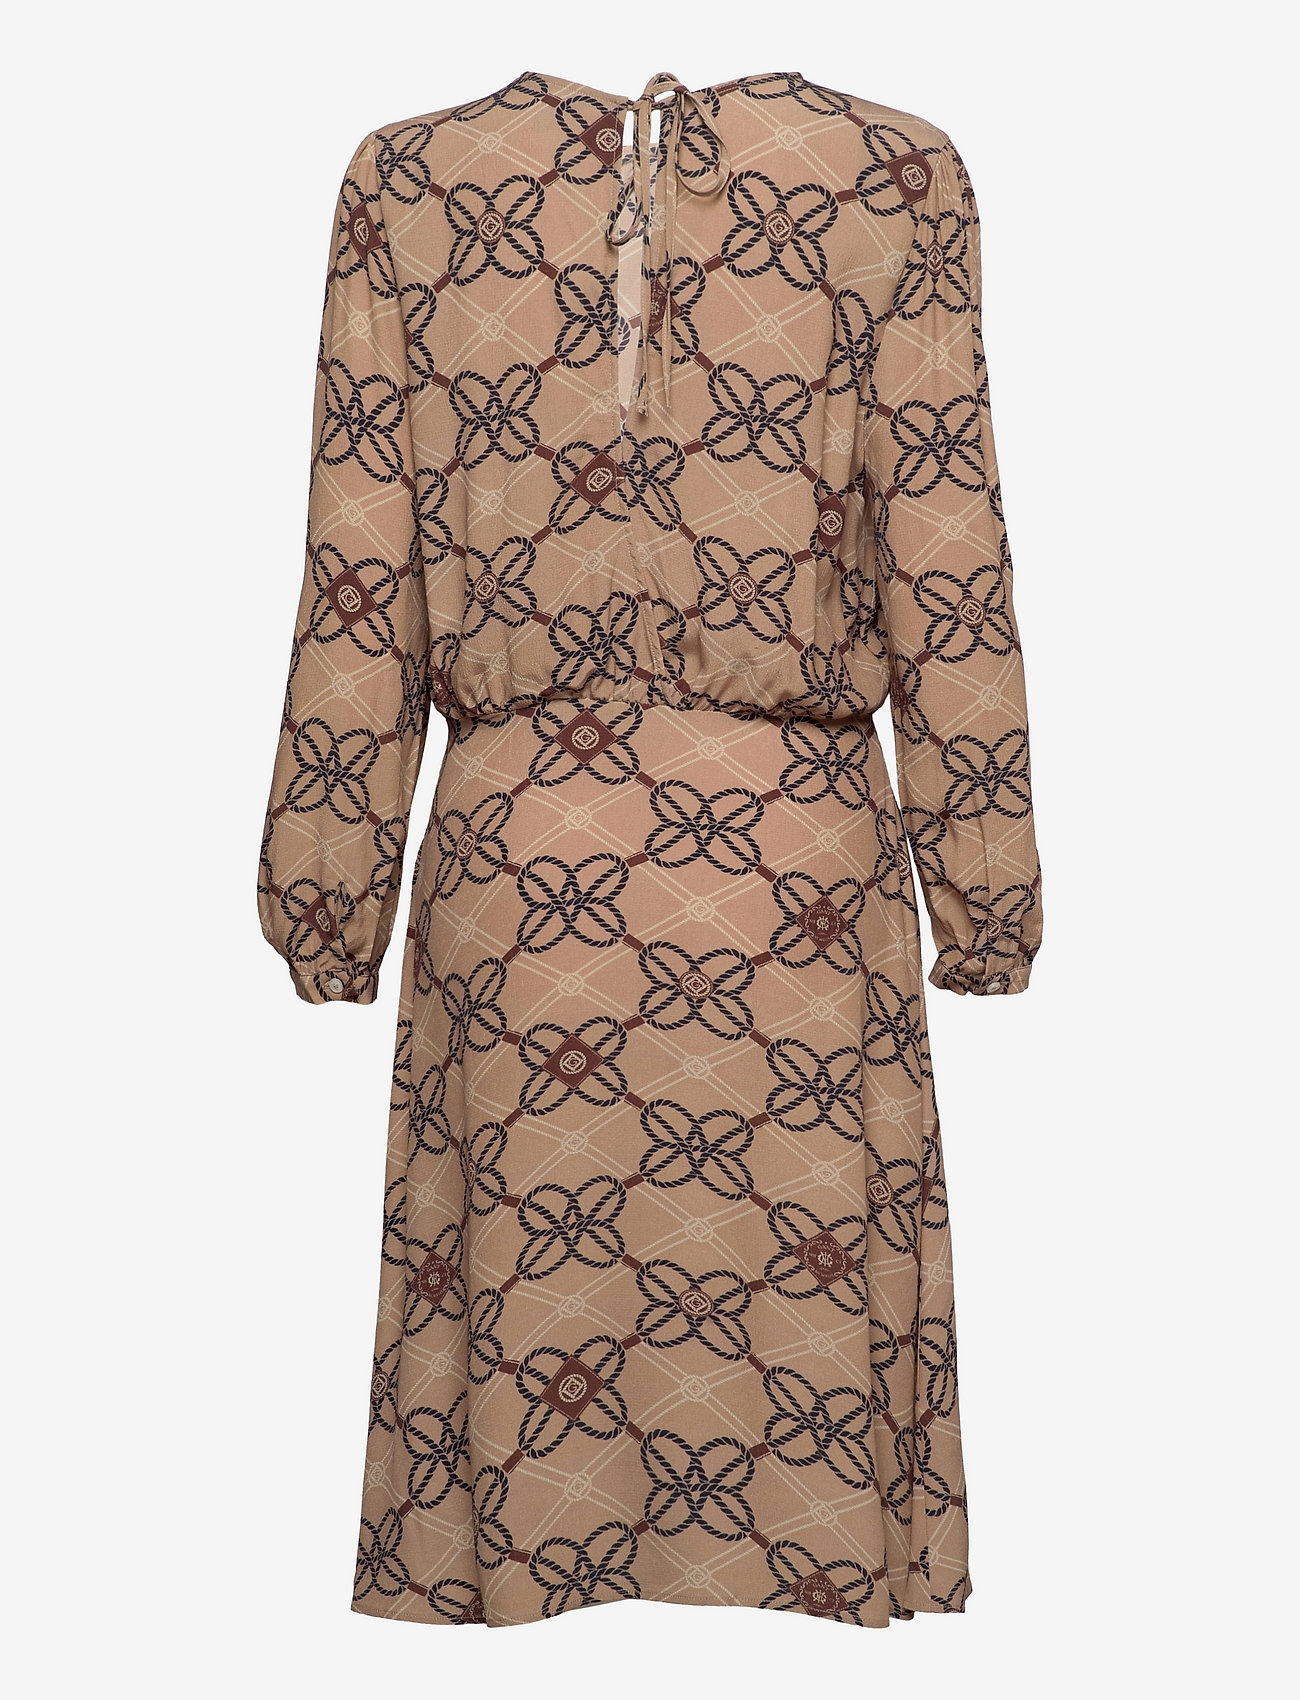 GANT - D1. ROPE PRINT VISCOSE CREPE DRESS - everyday dresses - warm khaki - 1